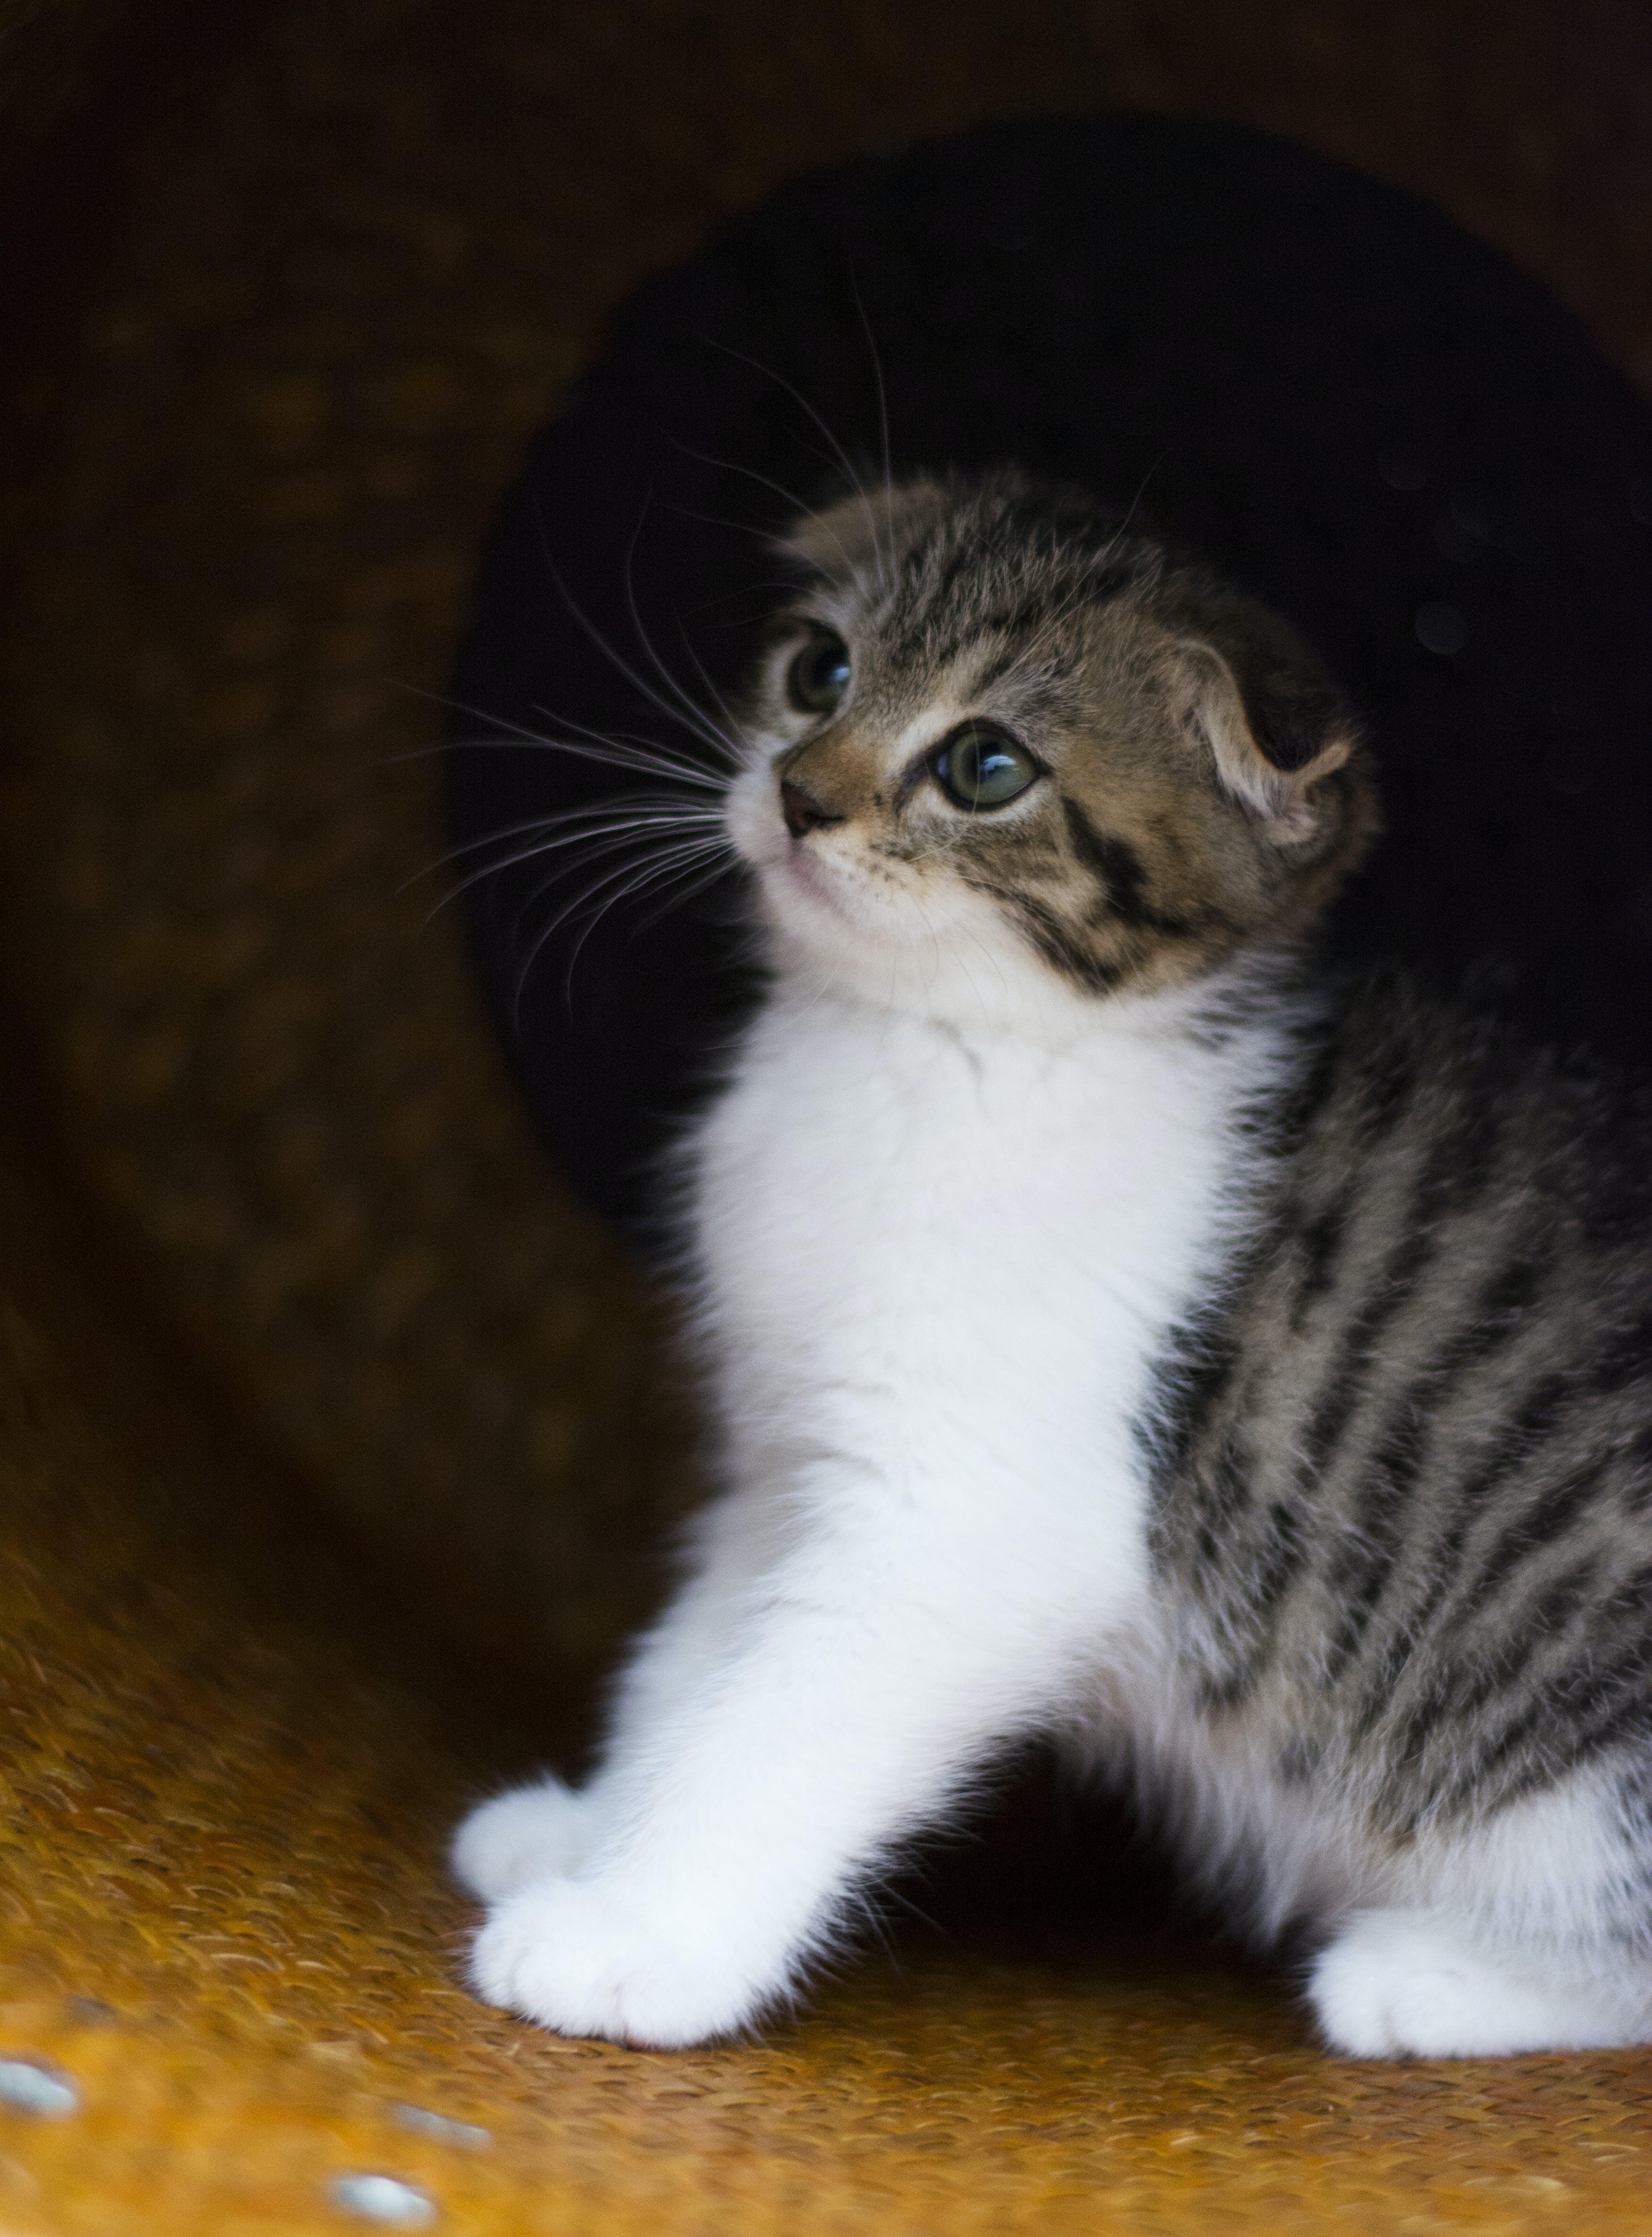 Free stock photo of animal, cat, Eye focus, feline